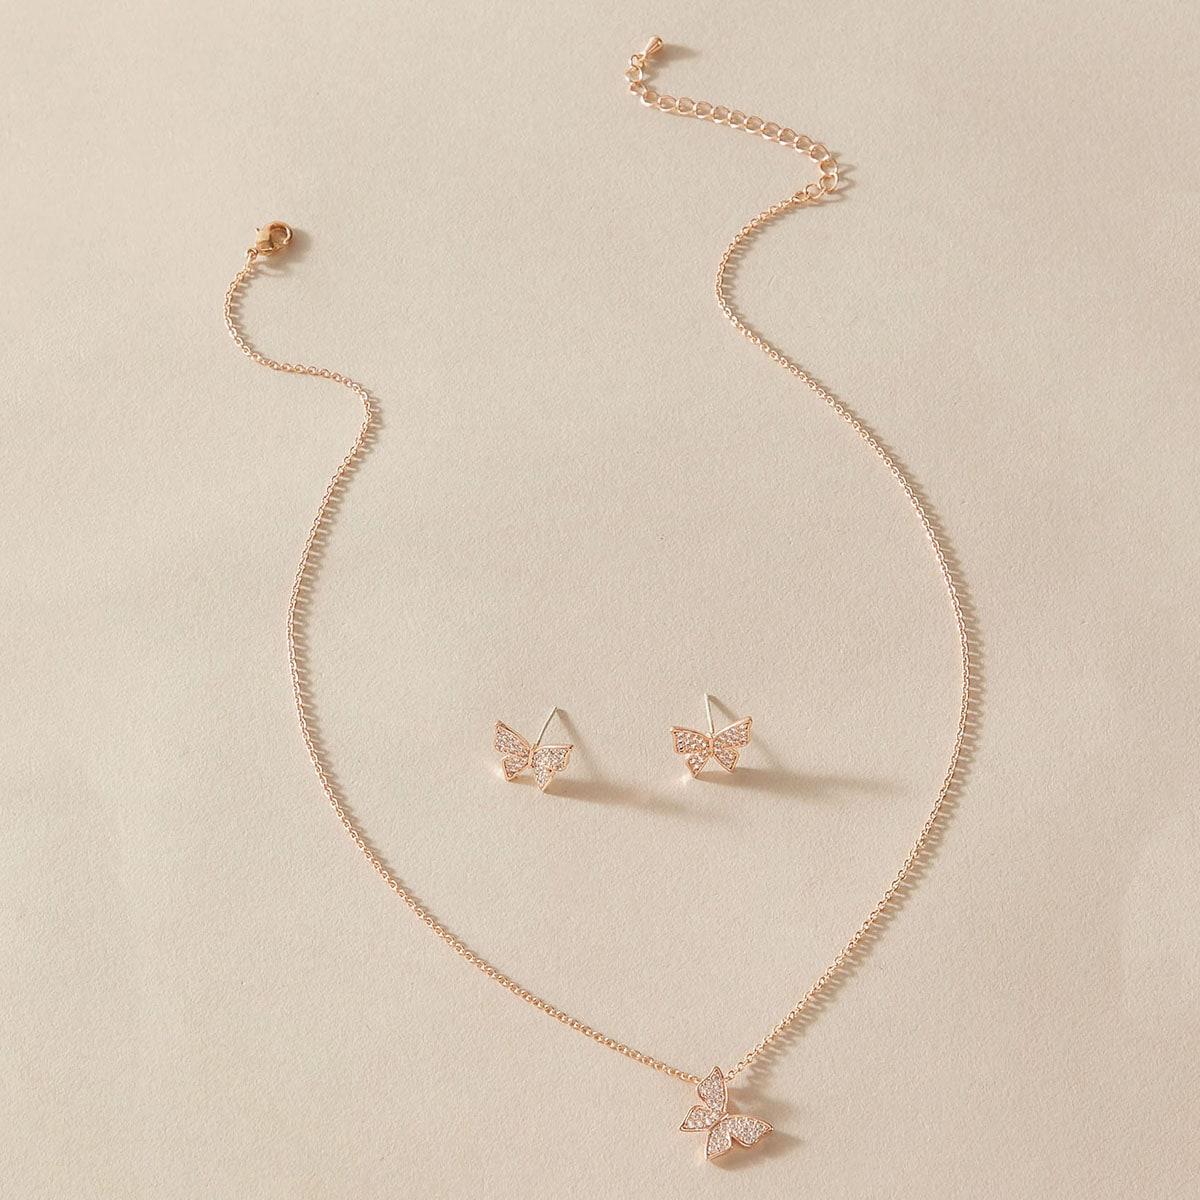 3 Stücke Schmetterling Design Charme Halskette & Ohrringe